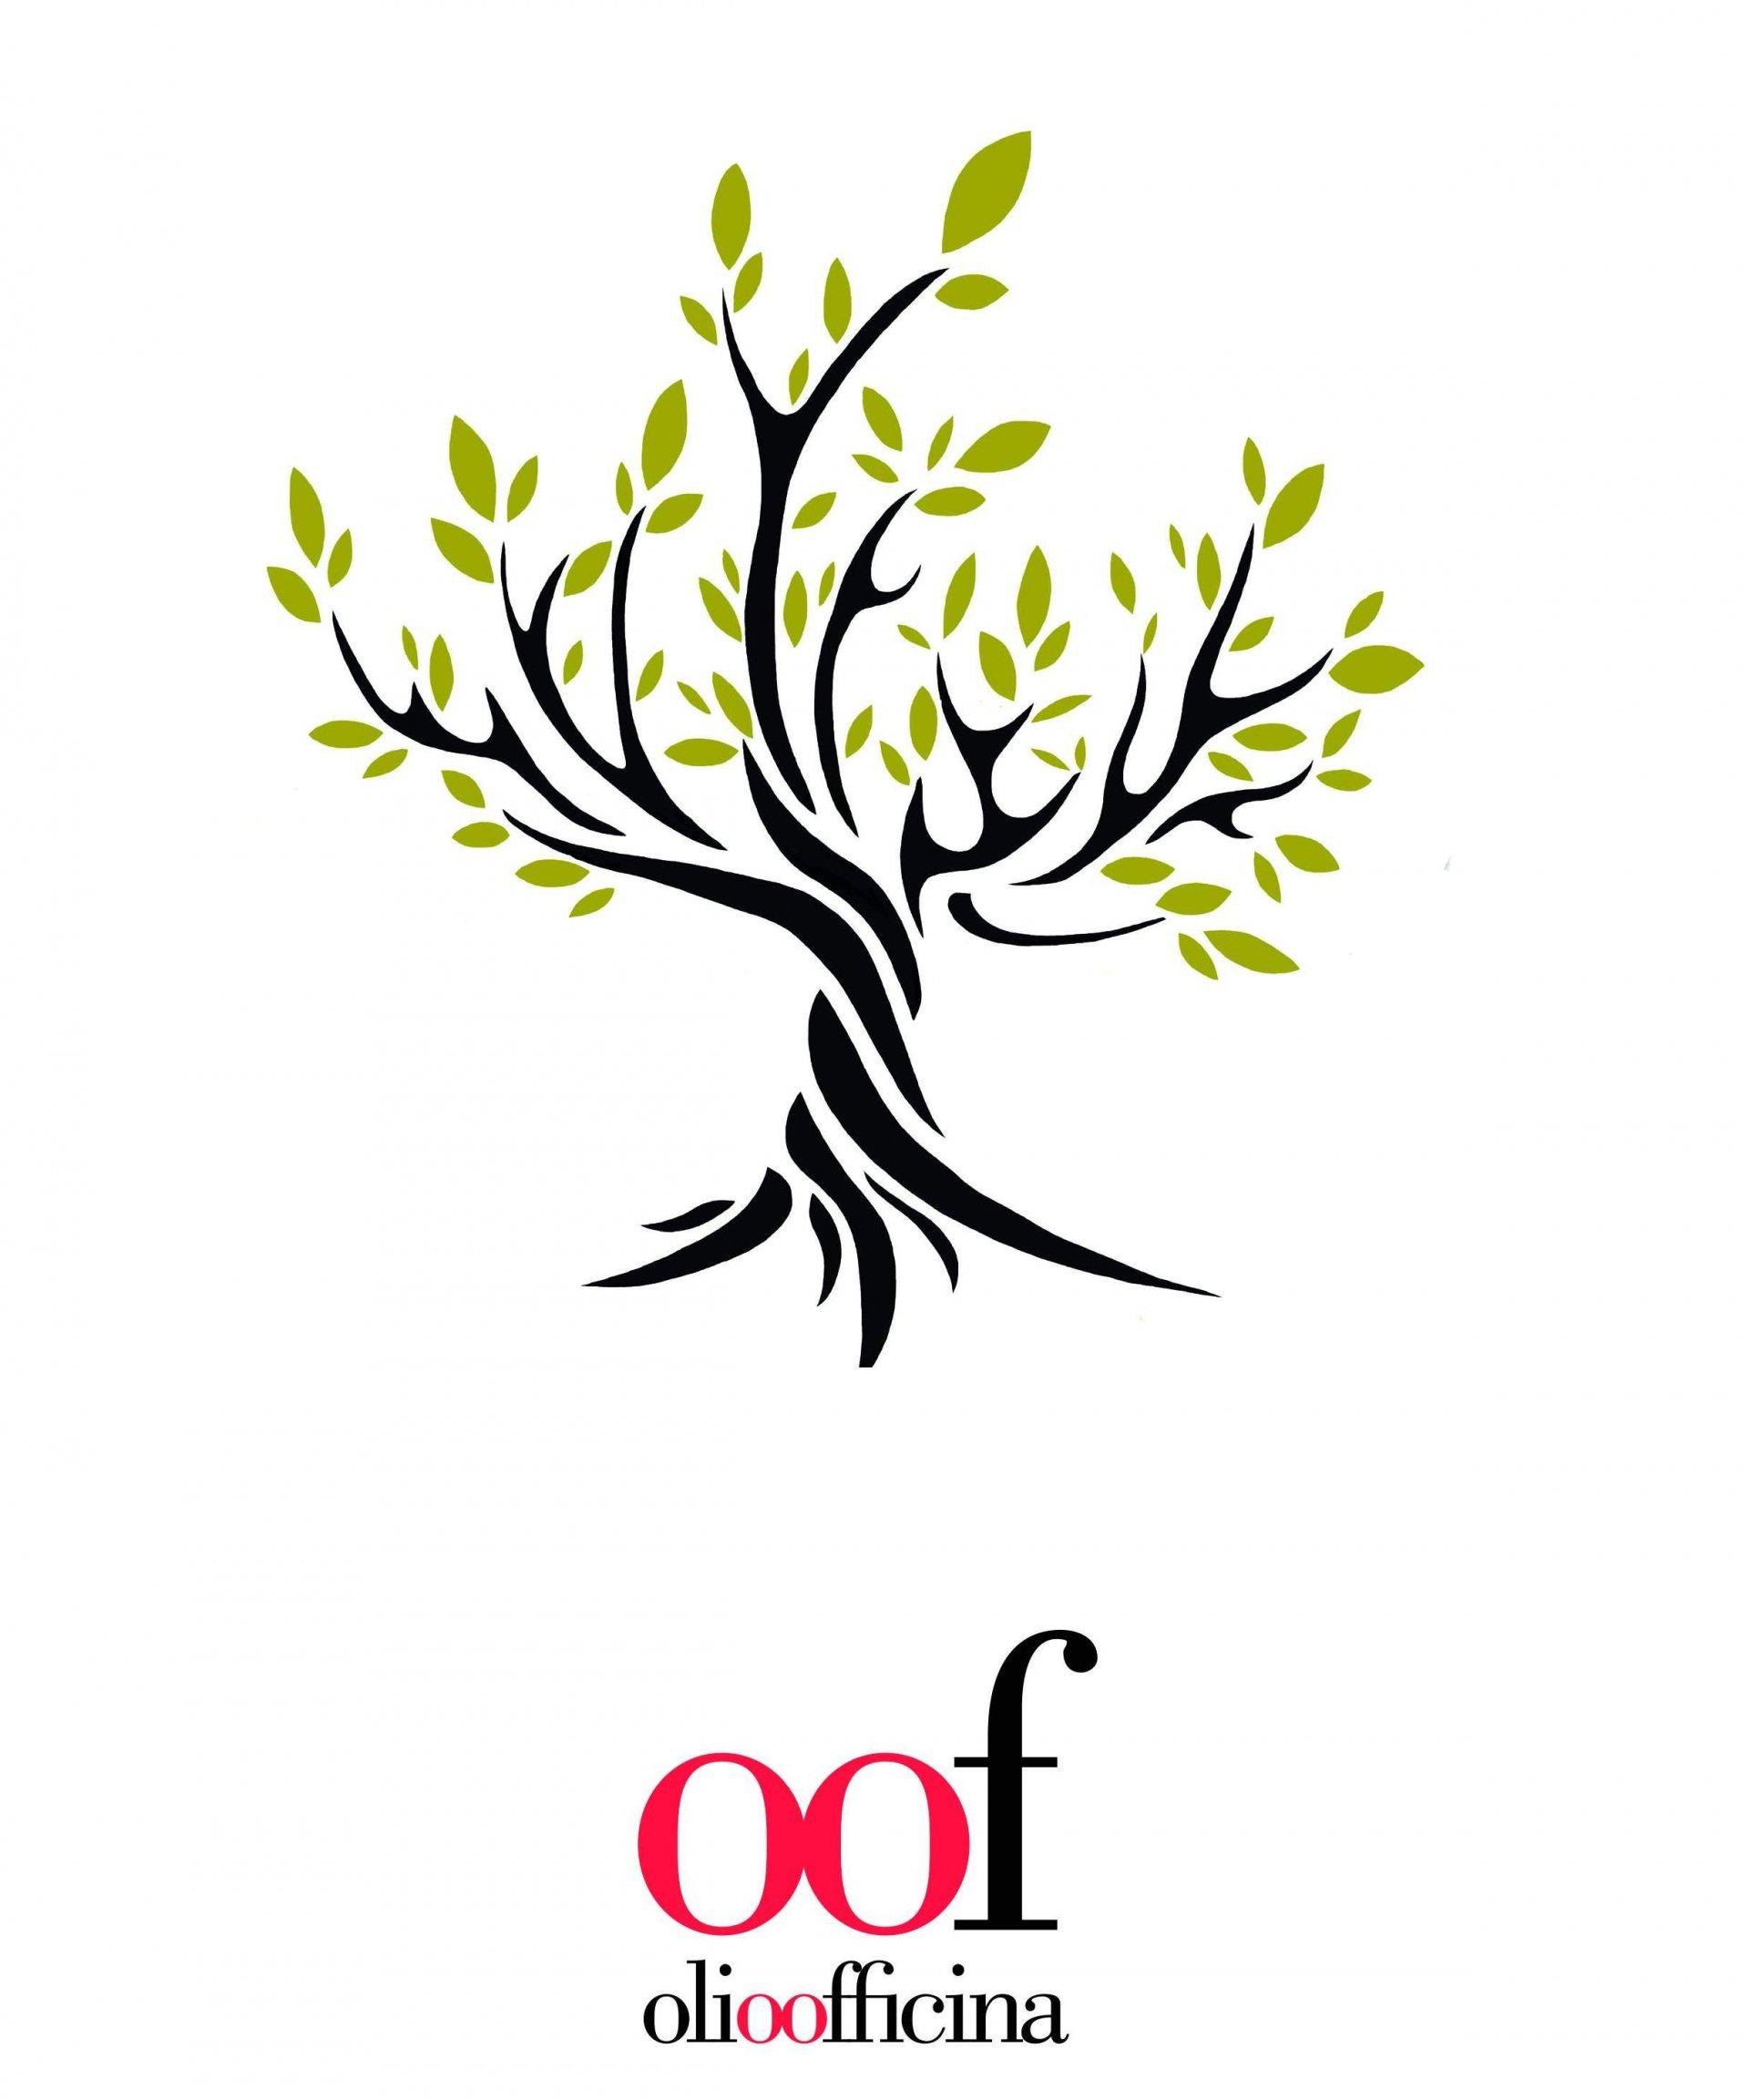 The 2016 Olio Officina Oil Culture award